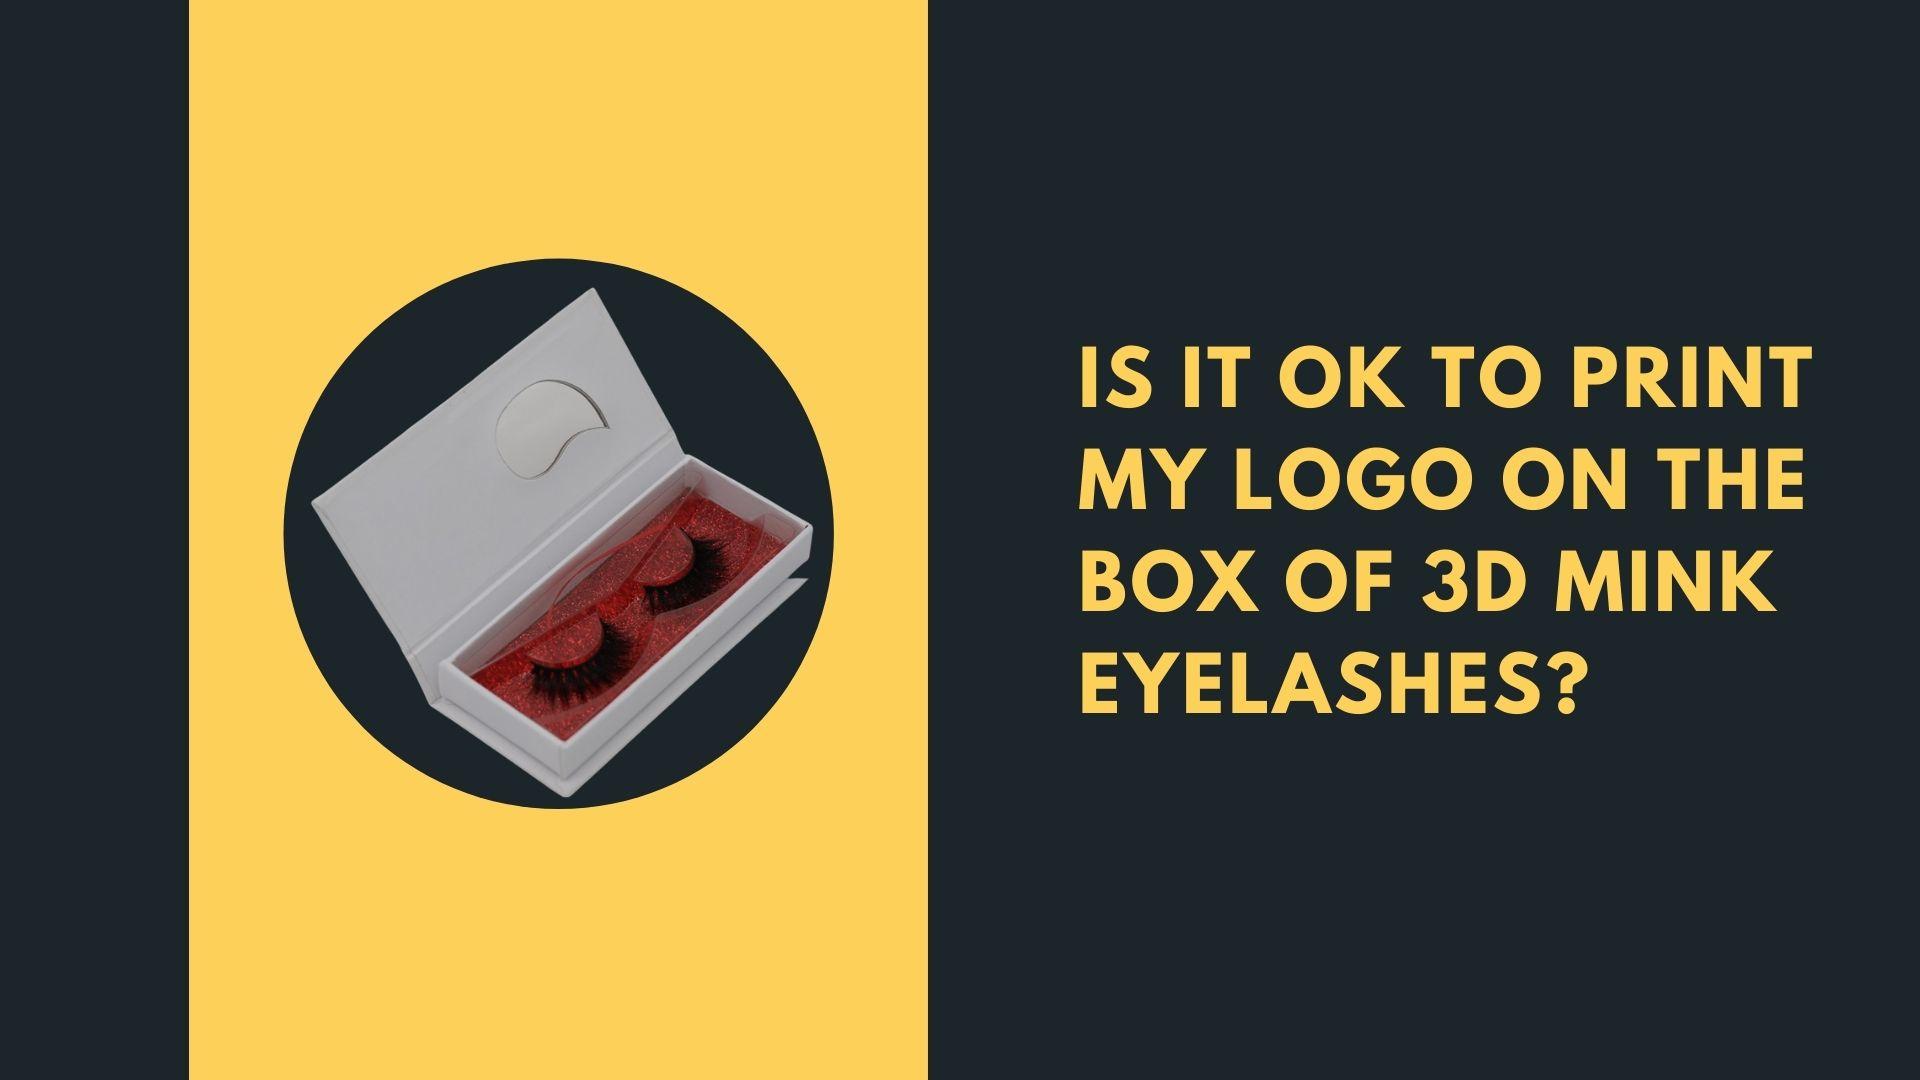 Is it ok to print my logo on the box of 3D mink eyelashes